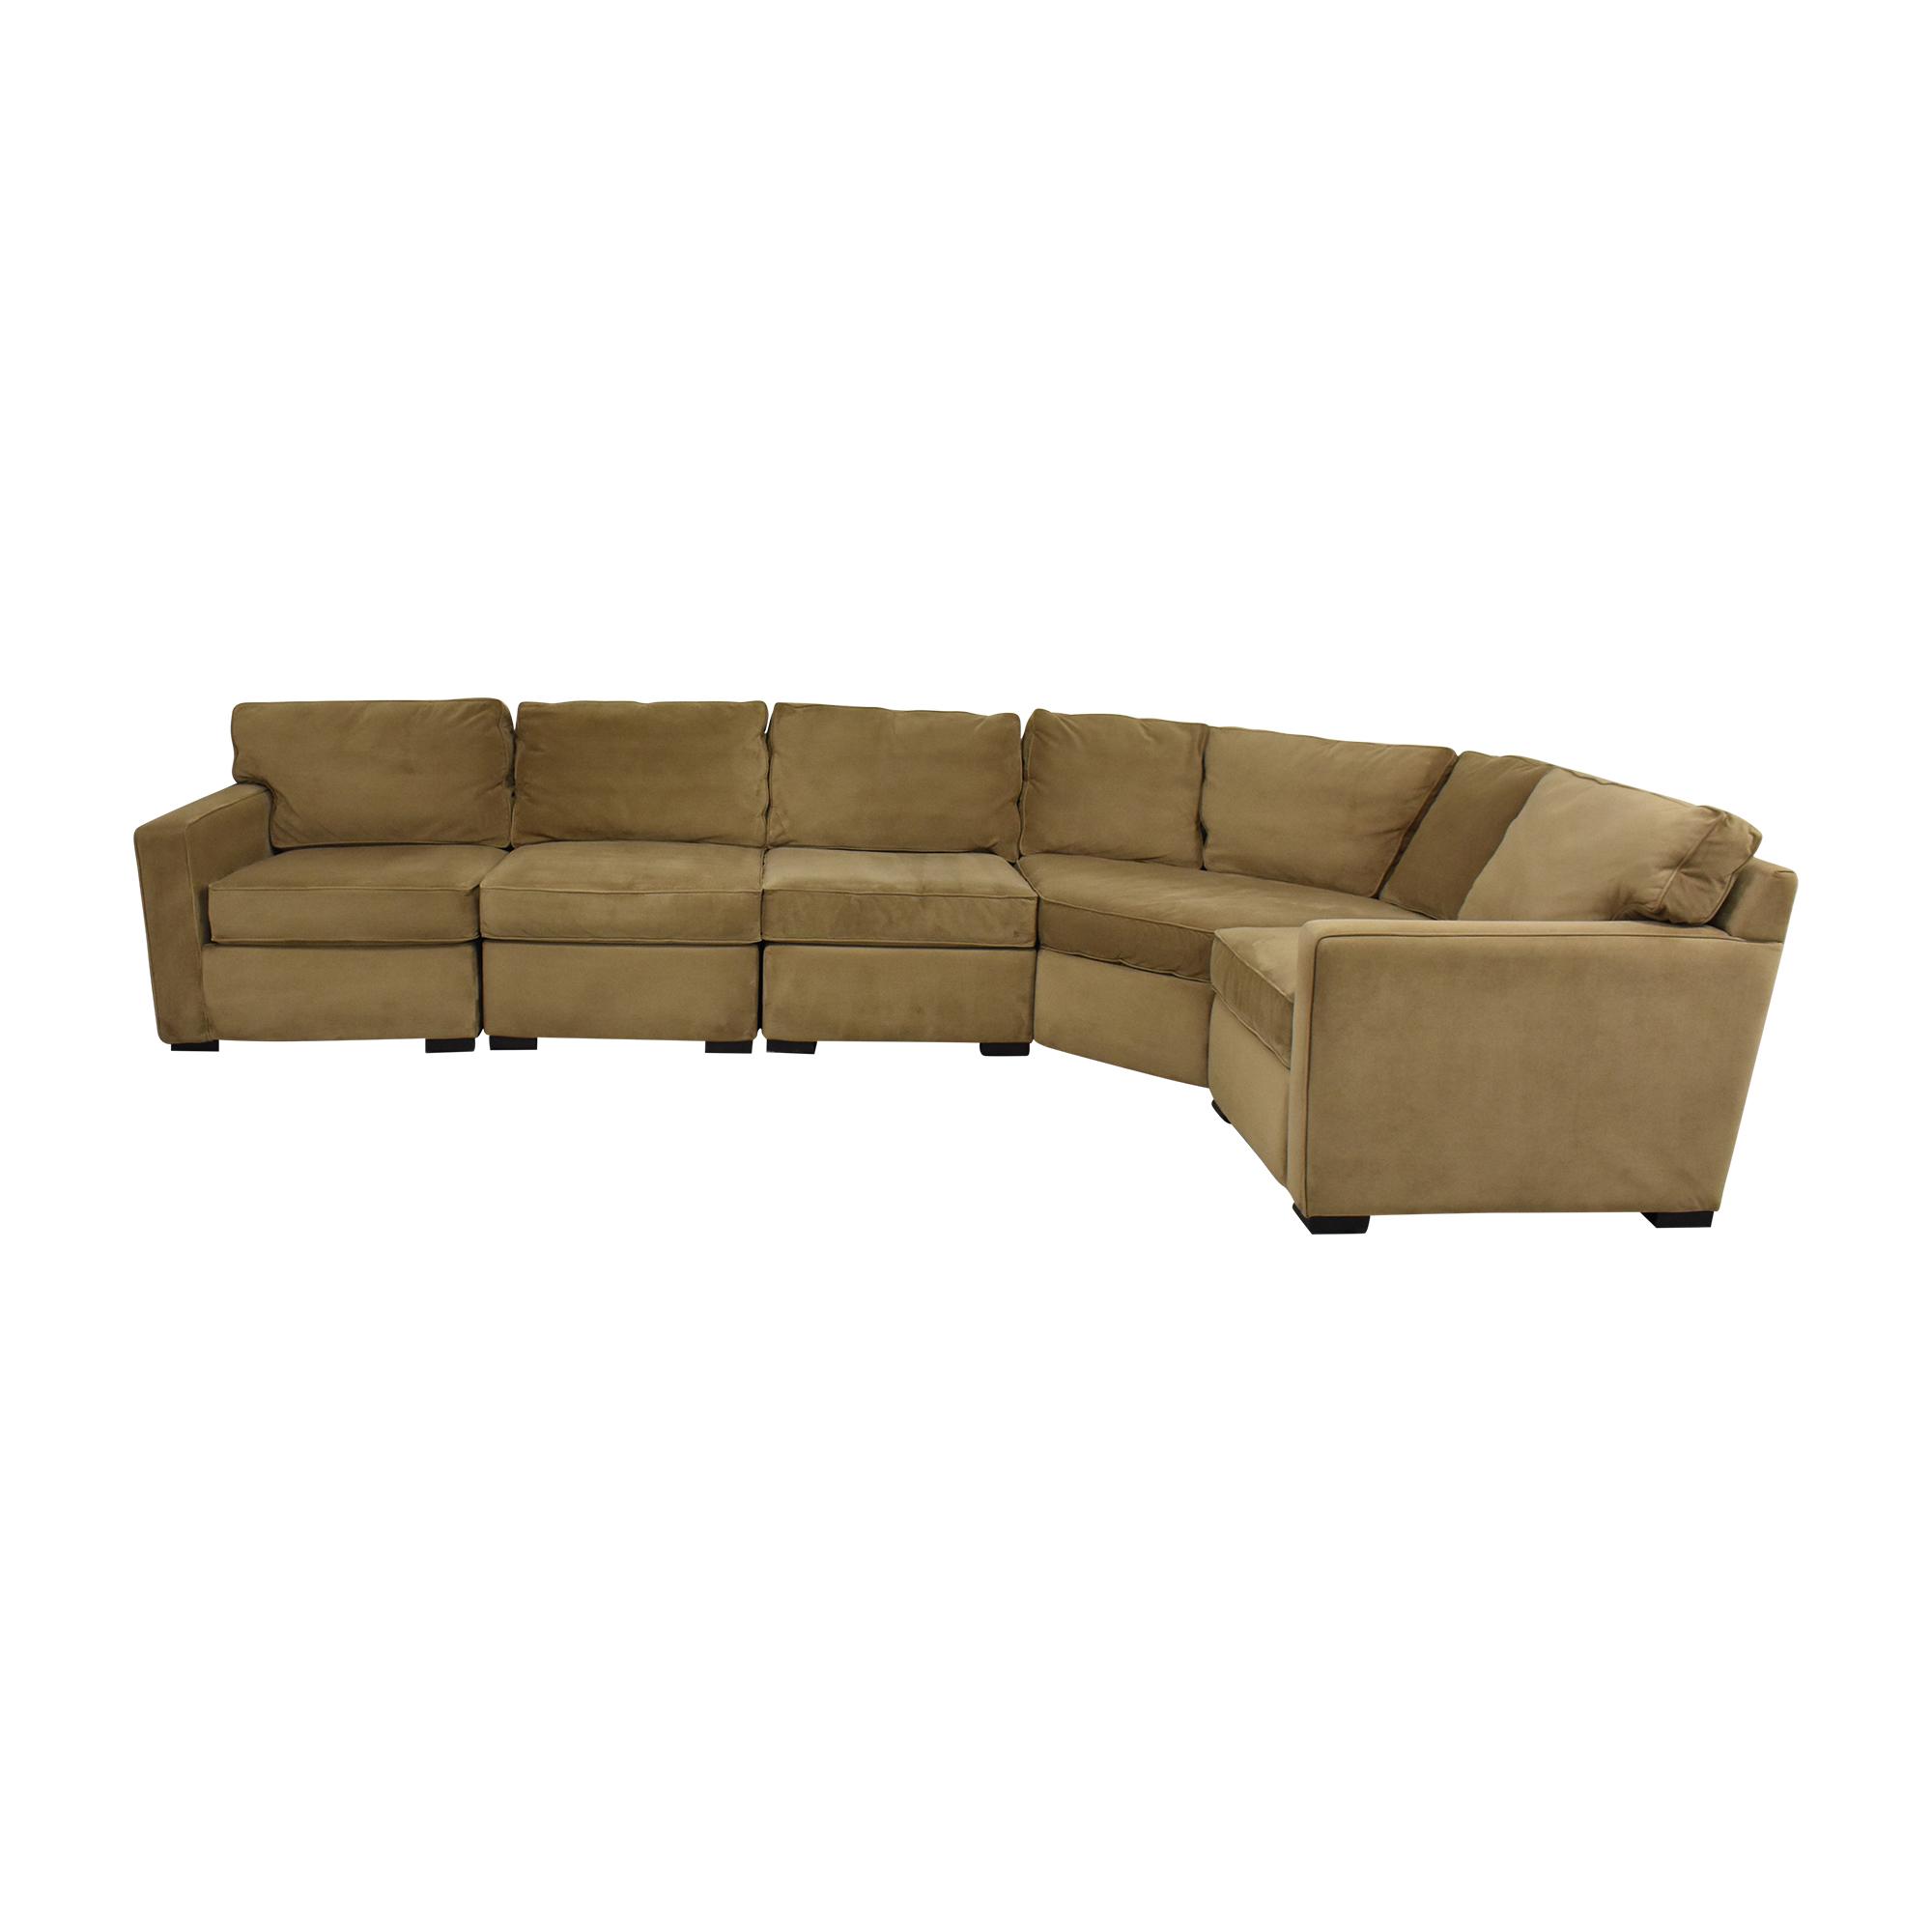 Macy's Macy's Jonathan Louis Corner Sectional Sofa dimensions